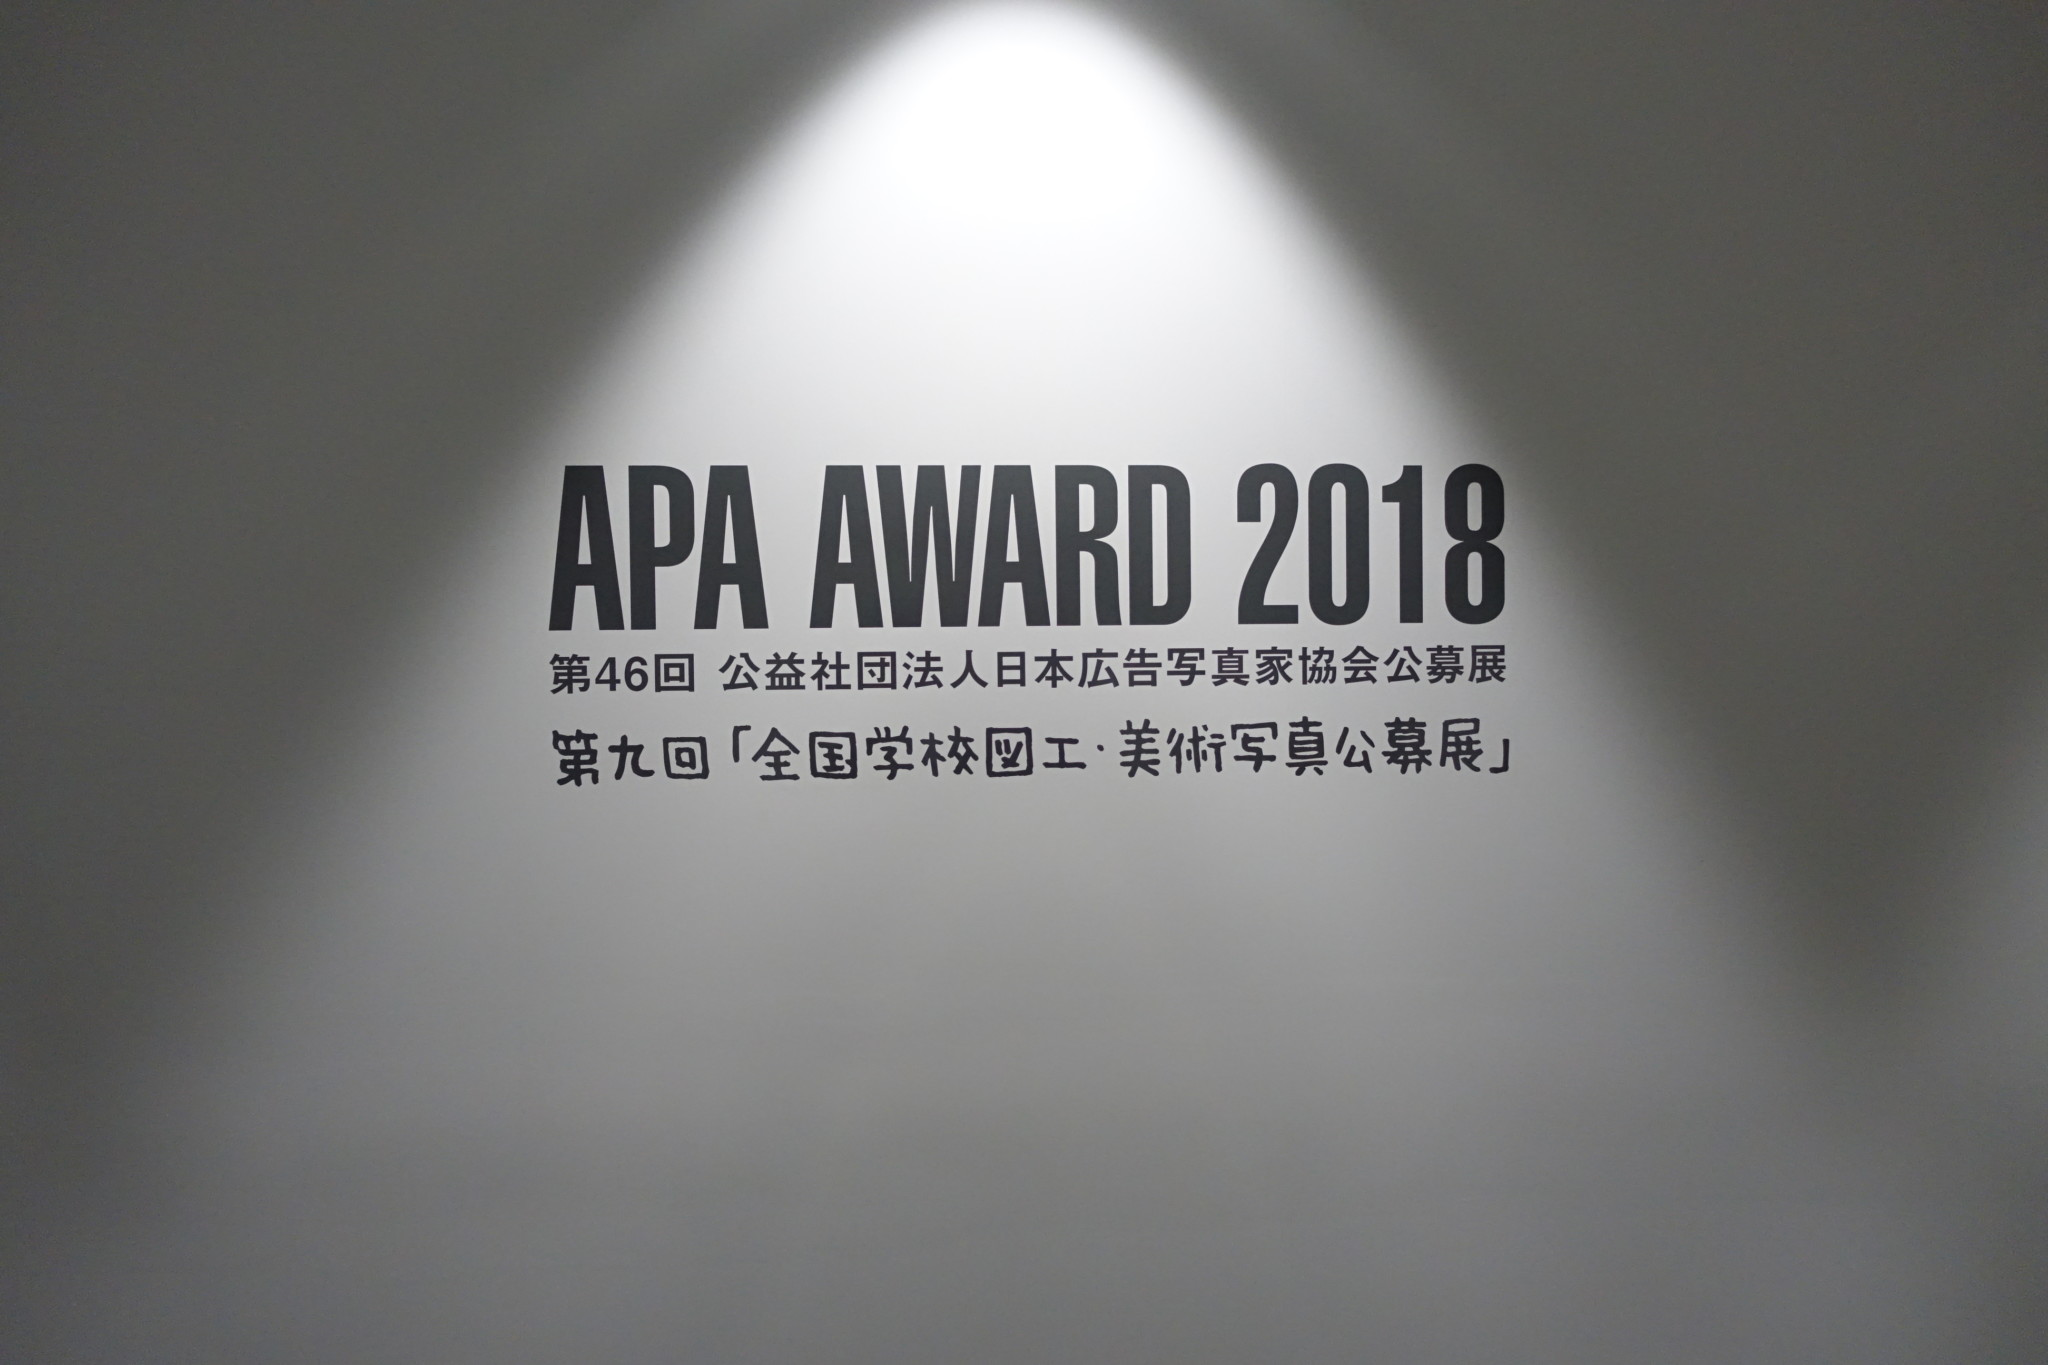 APAアワード2018 第46回公益社団法人日本広告写真家協会公募展